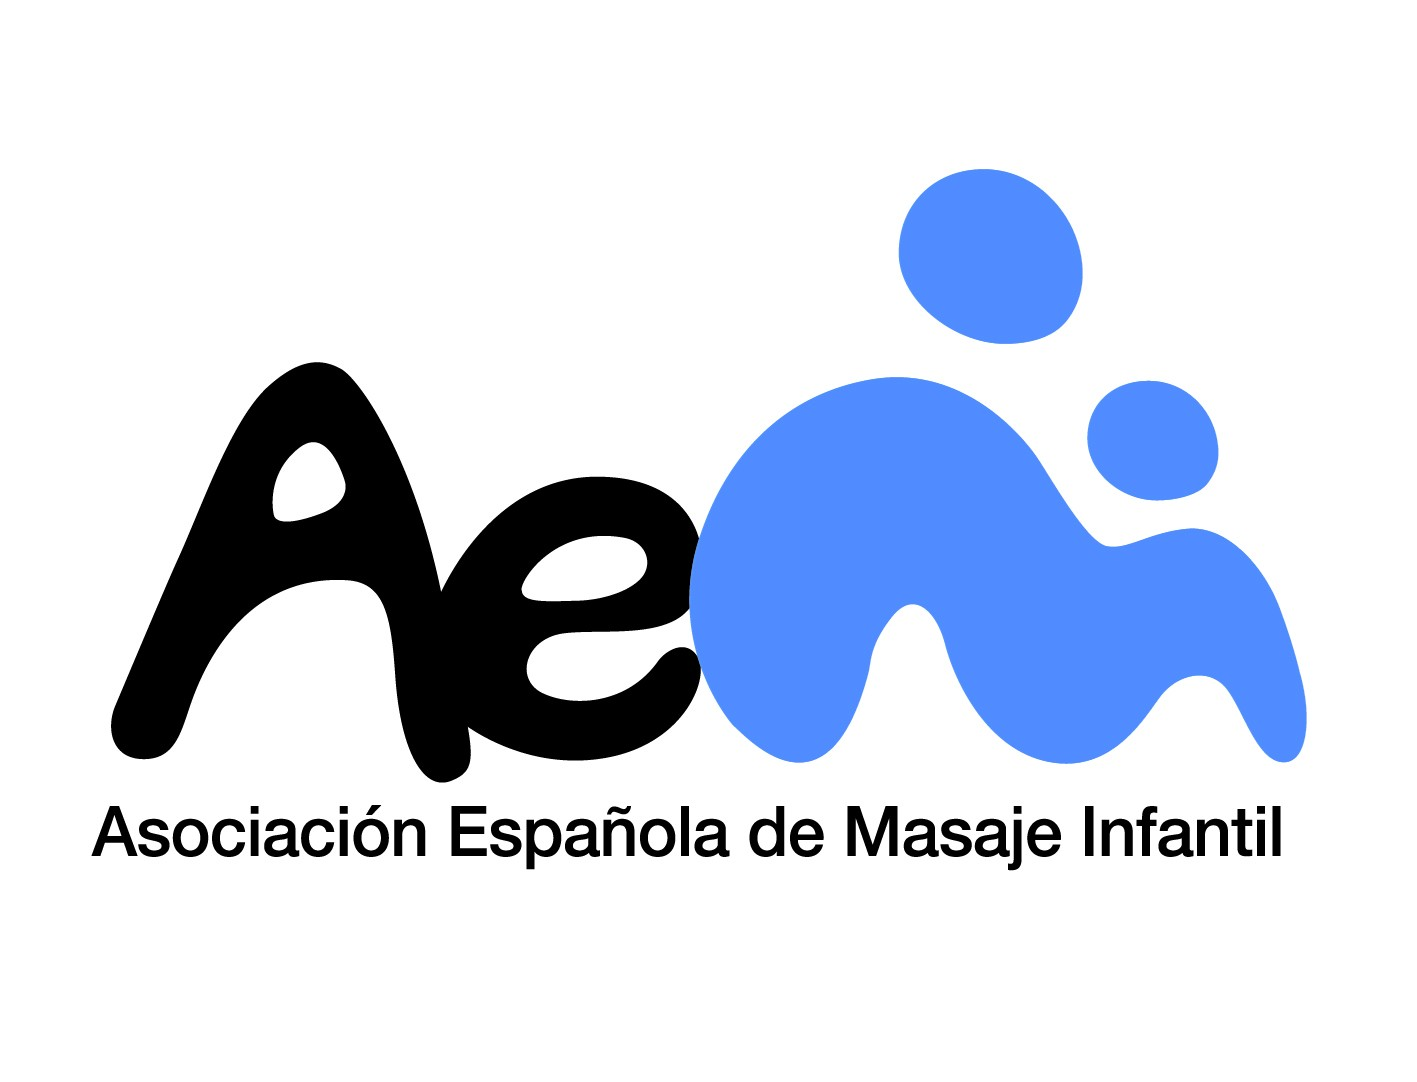 TALLER DE MASAJE INFANTIL AEMI